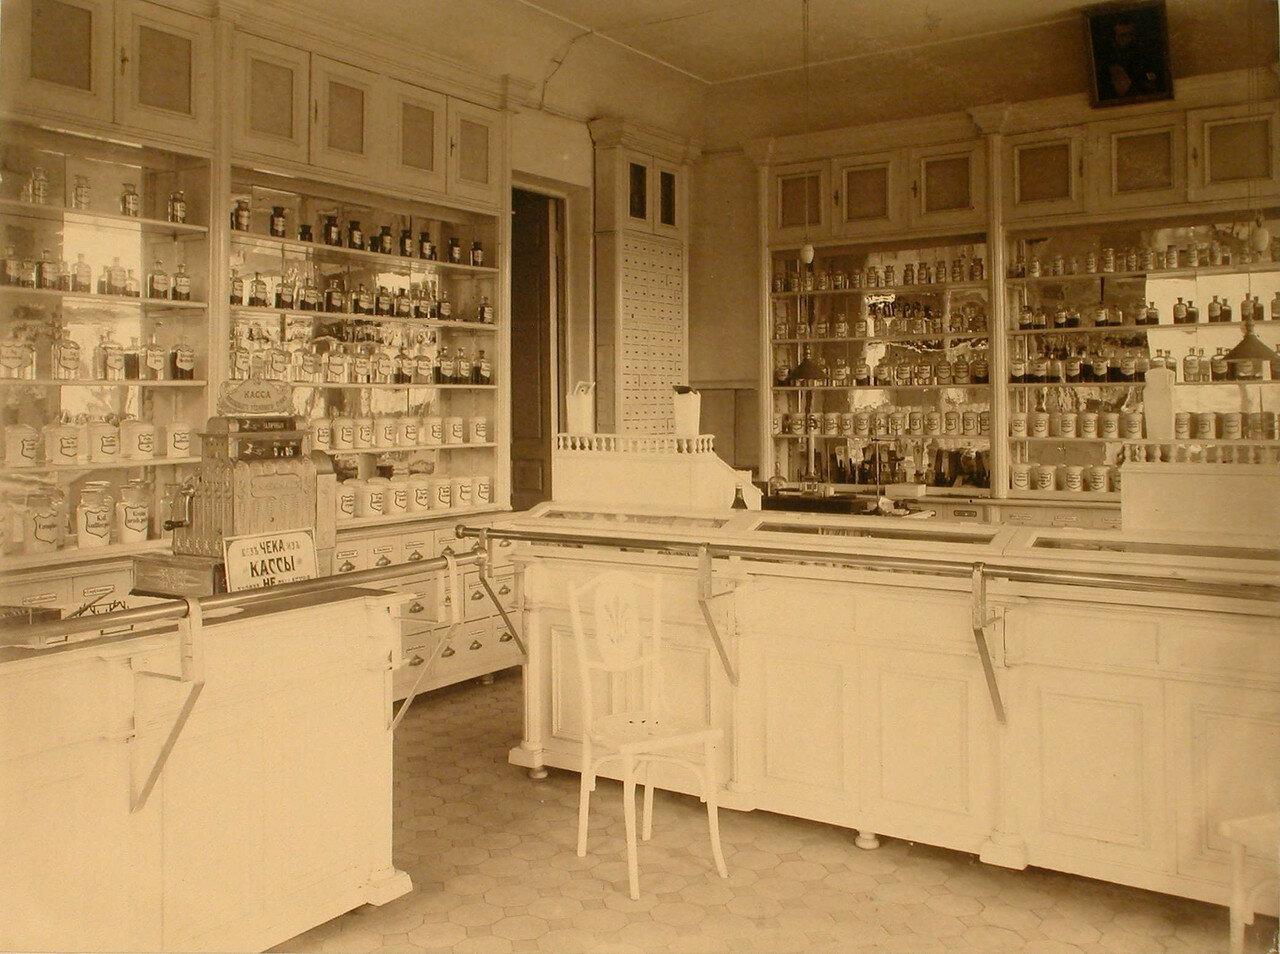 13. Внутренний вид помещения аптеки